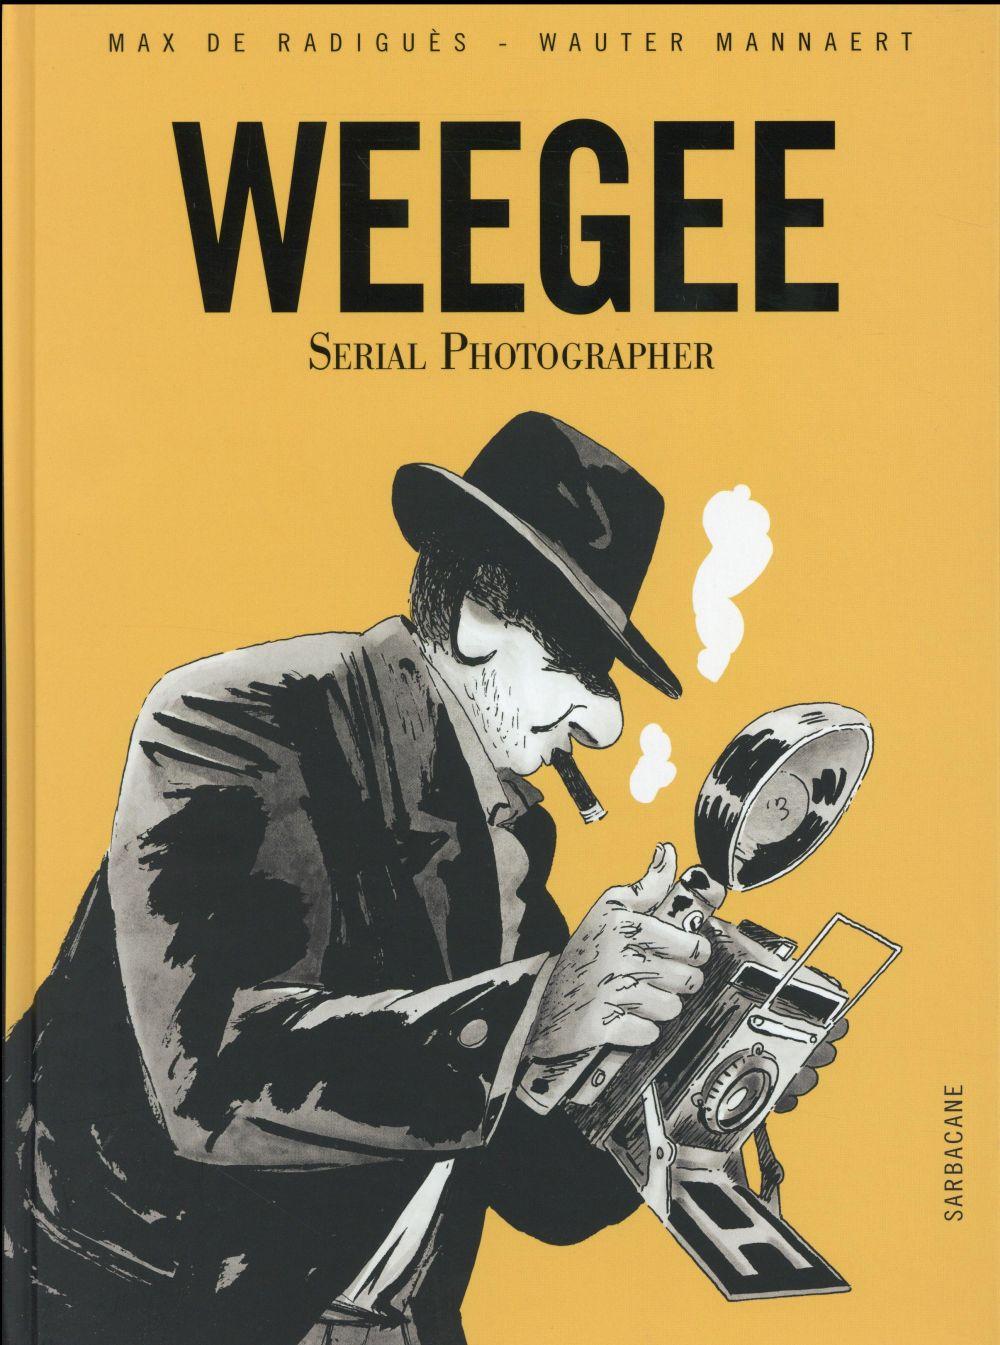 Weegee, seria photographer